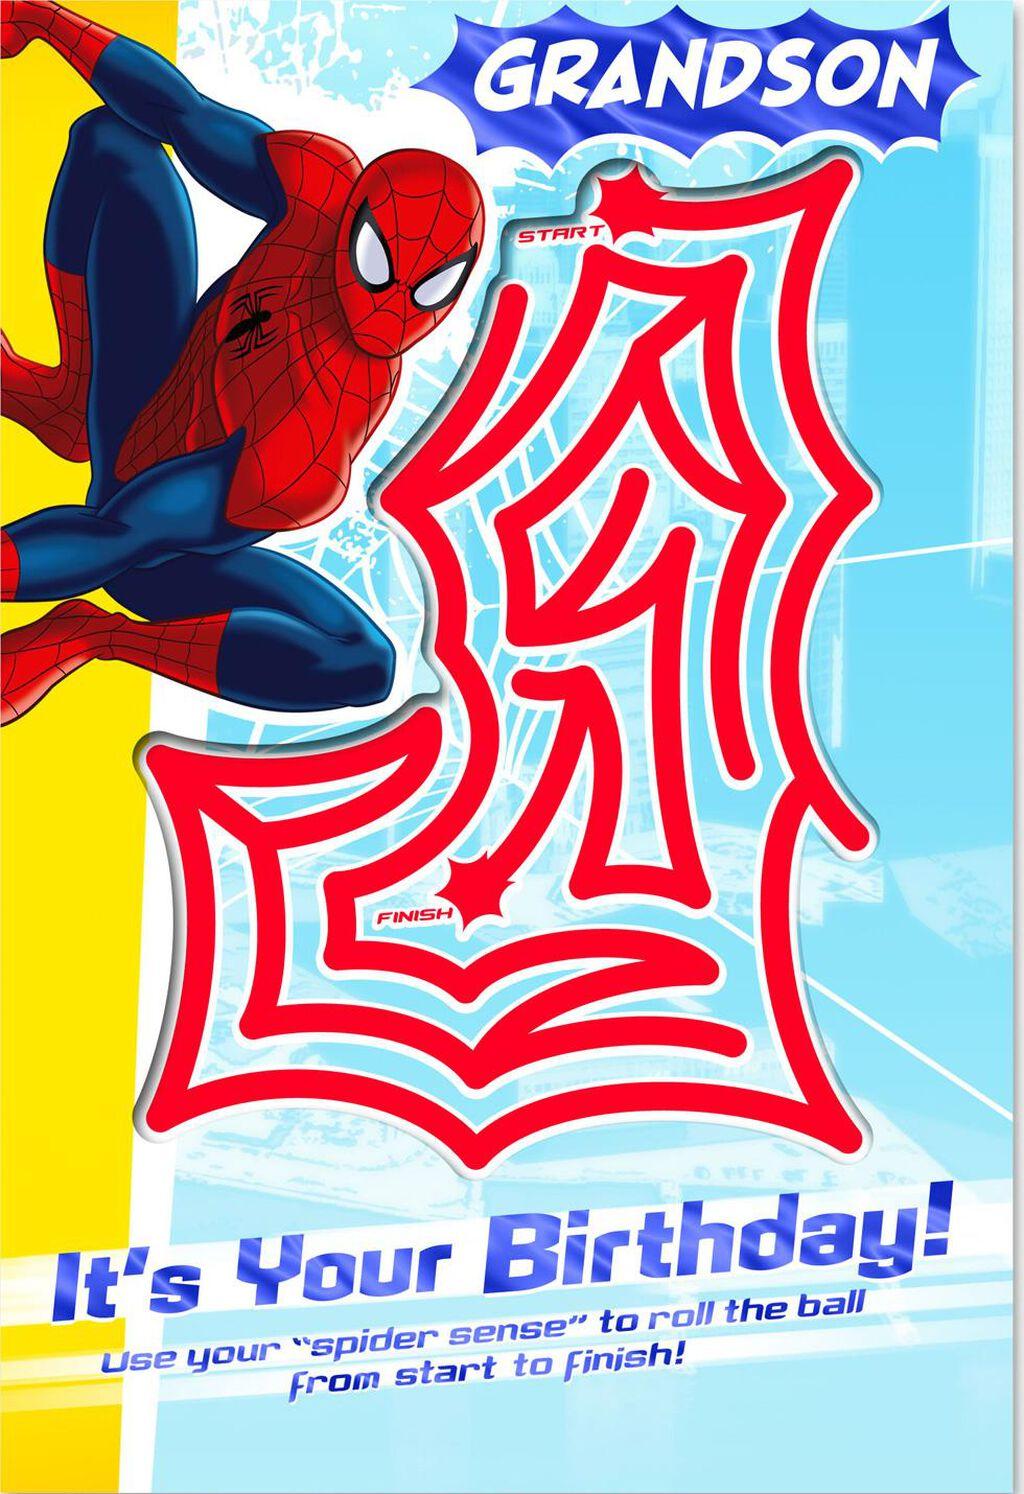 Marvel Spider Man Birthday Card For Grandson With Pinball Maze